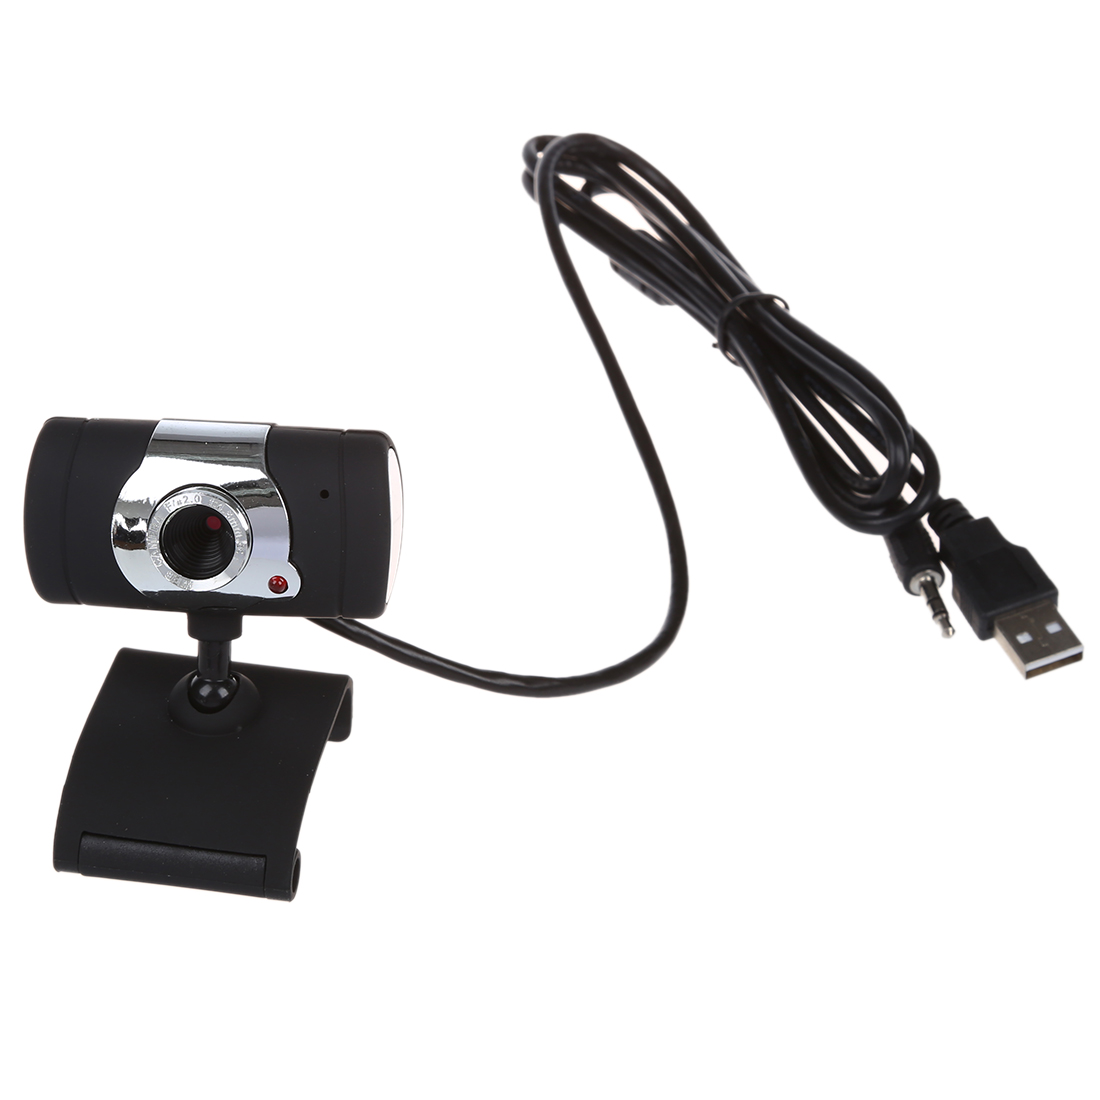 usb 2 0 hd webcam camera with microphone for pc laptop swivel black new ebay. Black Bedroom Furniture Sets. Home Design Ideas